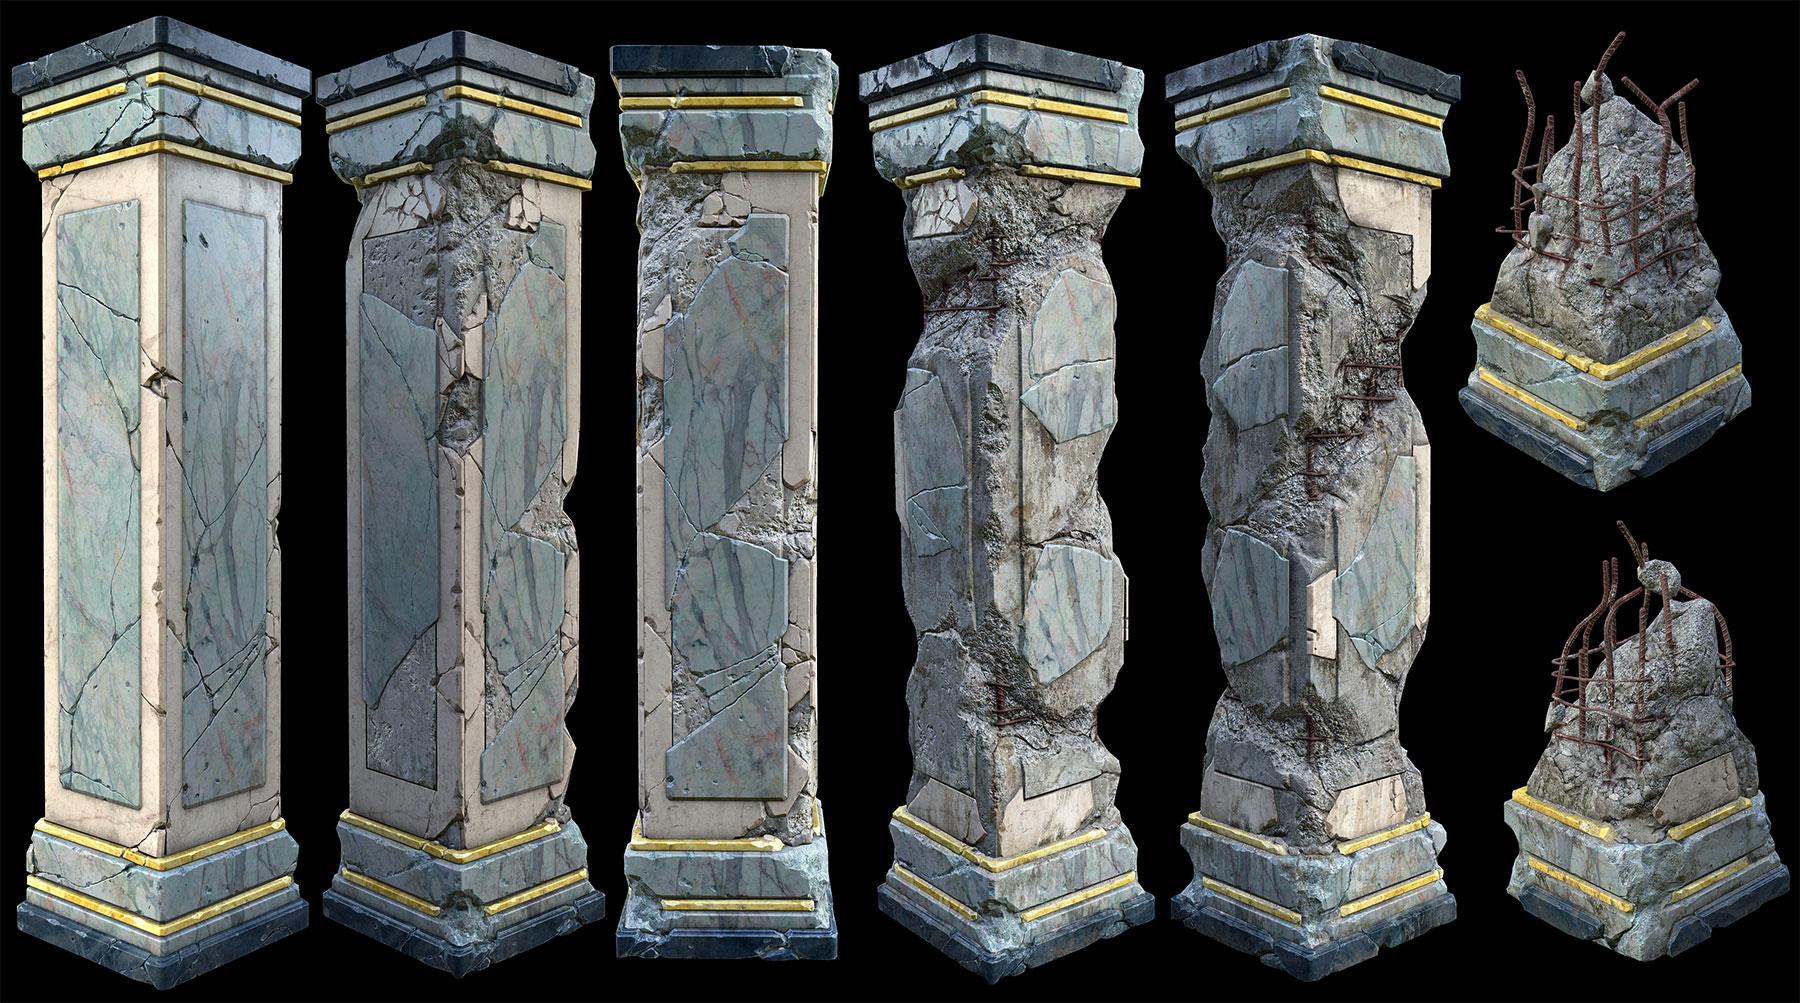 damaged marble pillars including resources zbrushes ztools ingame